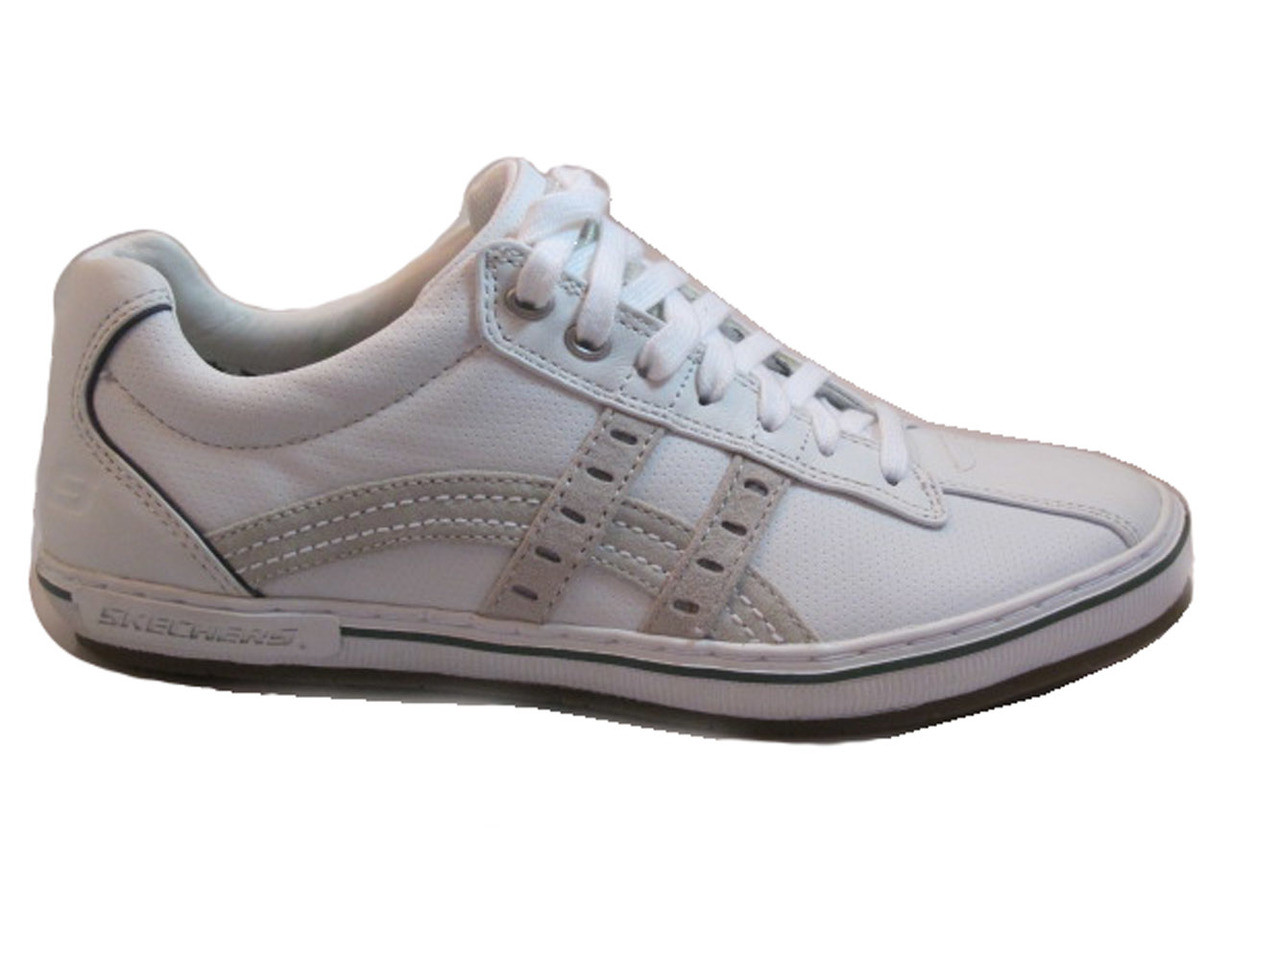 db90be0cb30b Skechers Men s lace up sneakers White Merric- Briano 61233 - Davinci ...